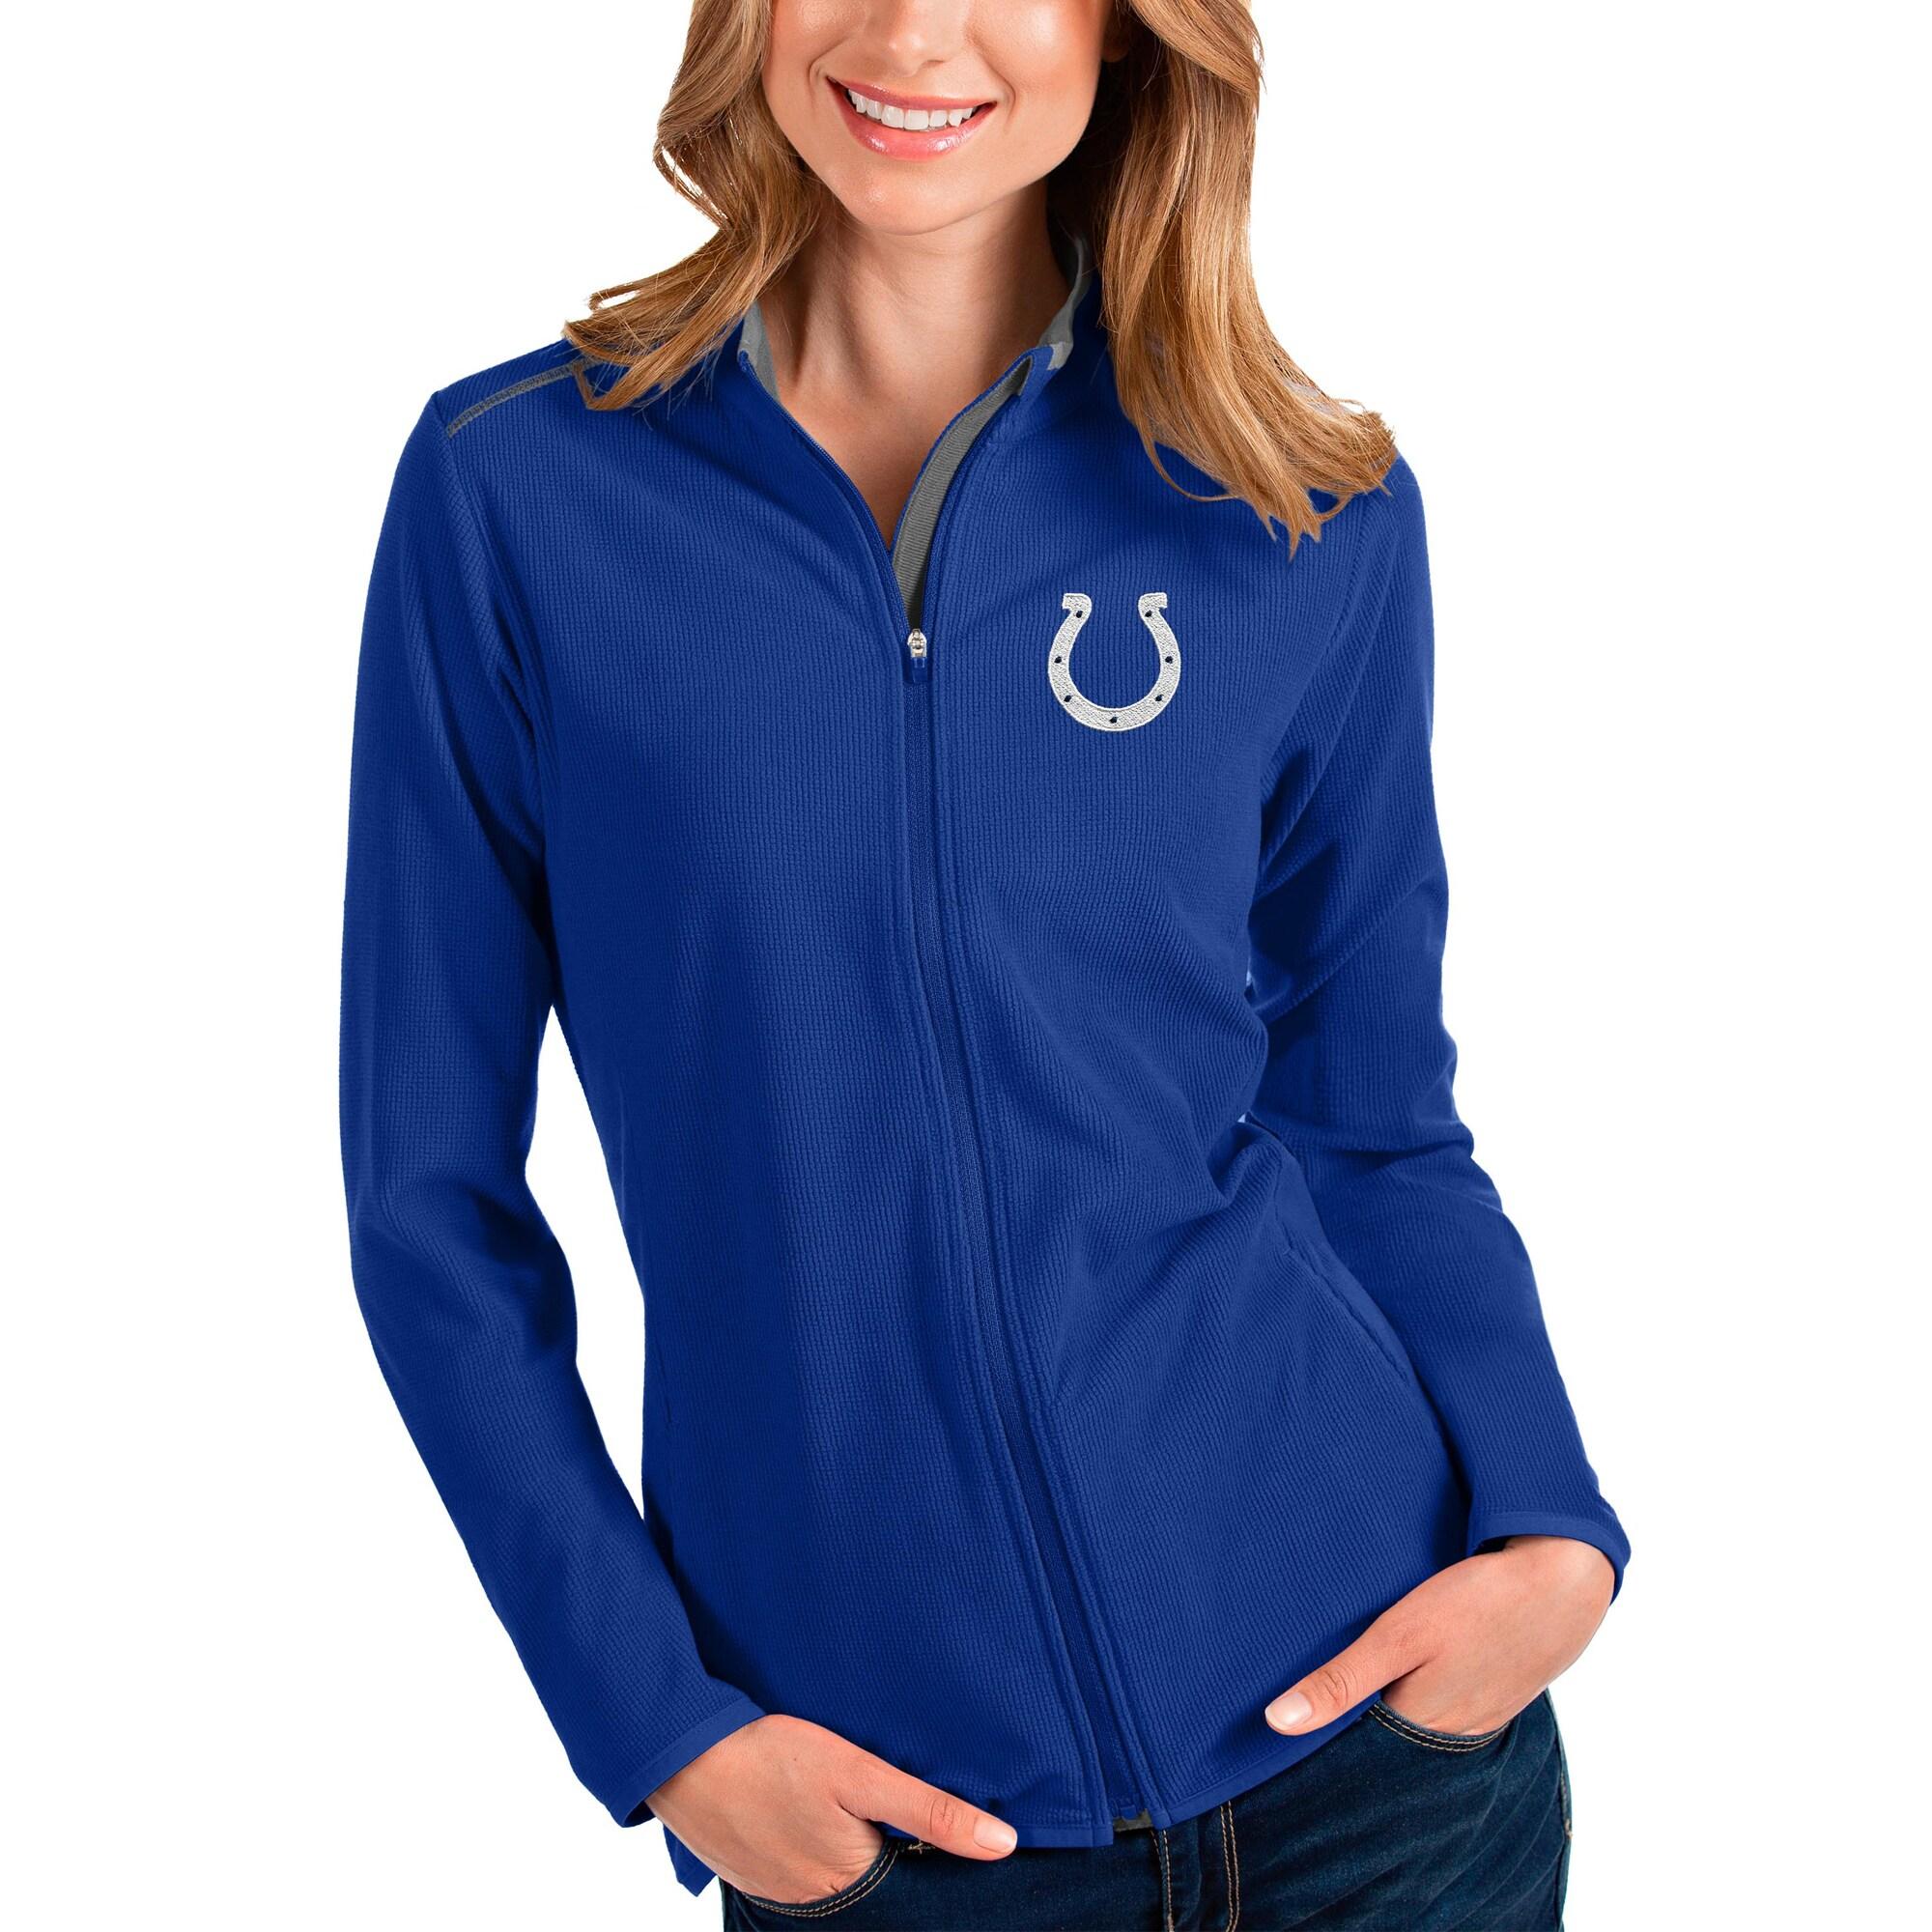 Indianapolis Colts Antigua Women's Glacier Full-Zip Jacket - Royal